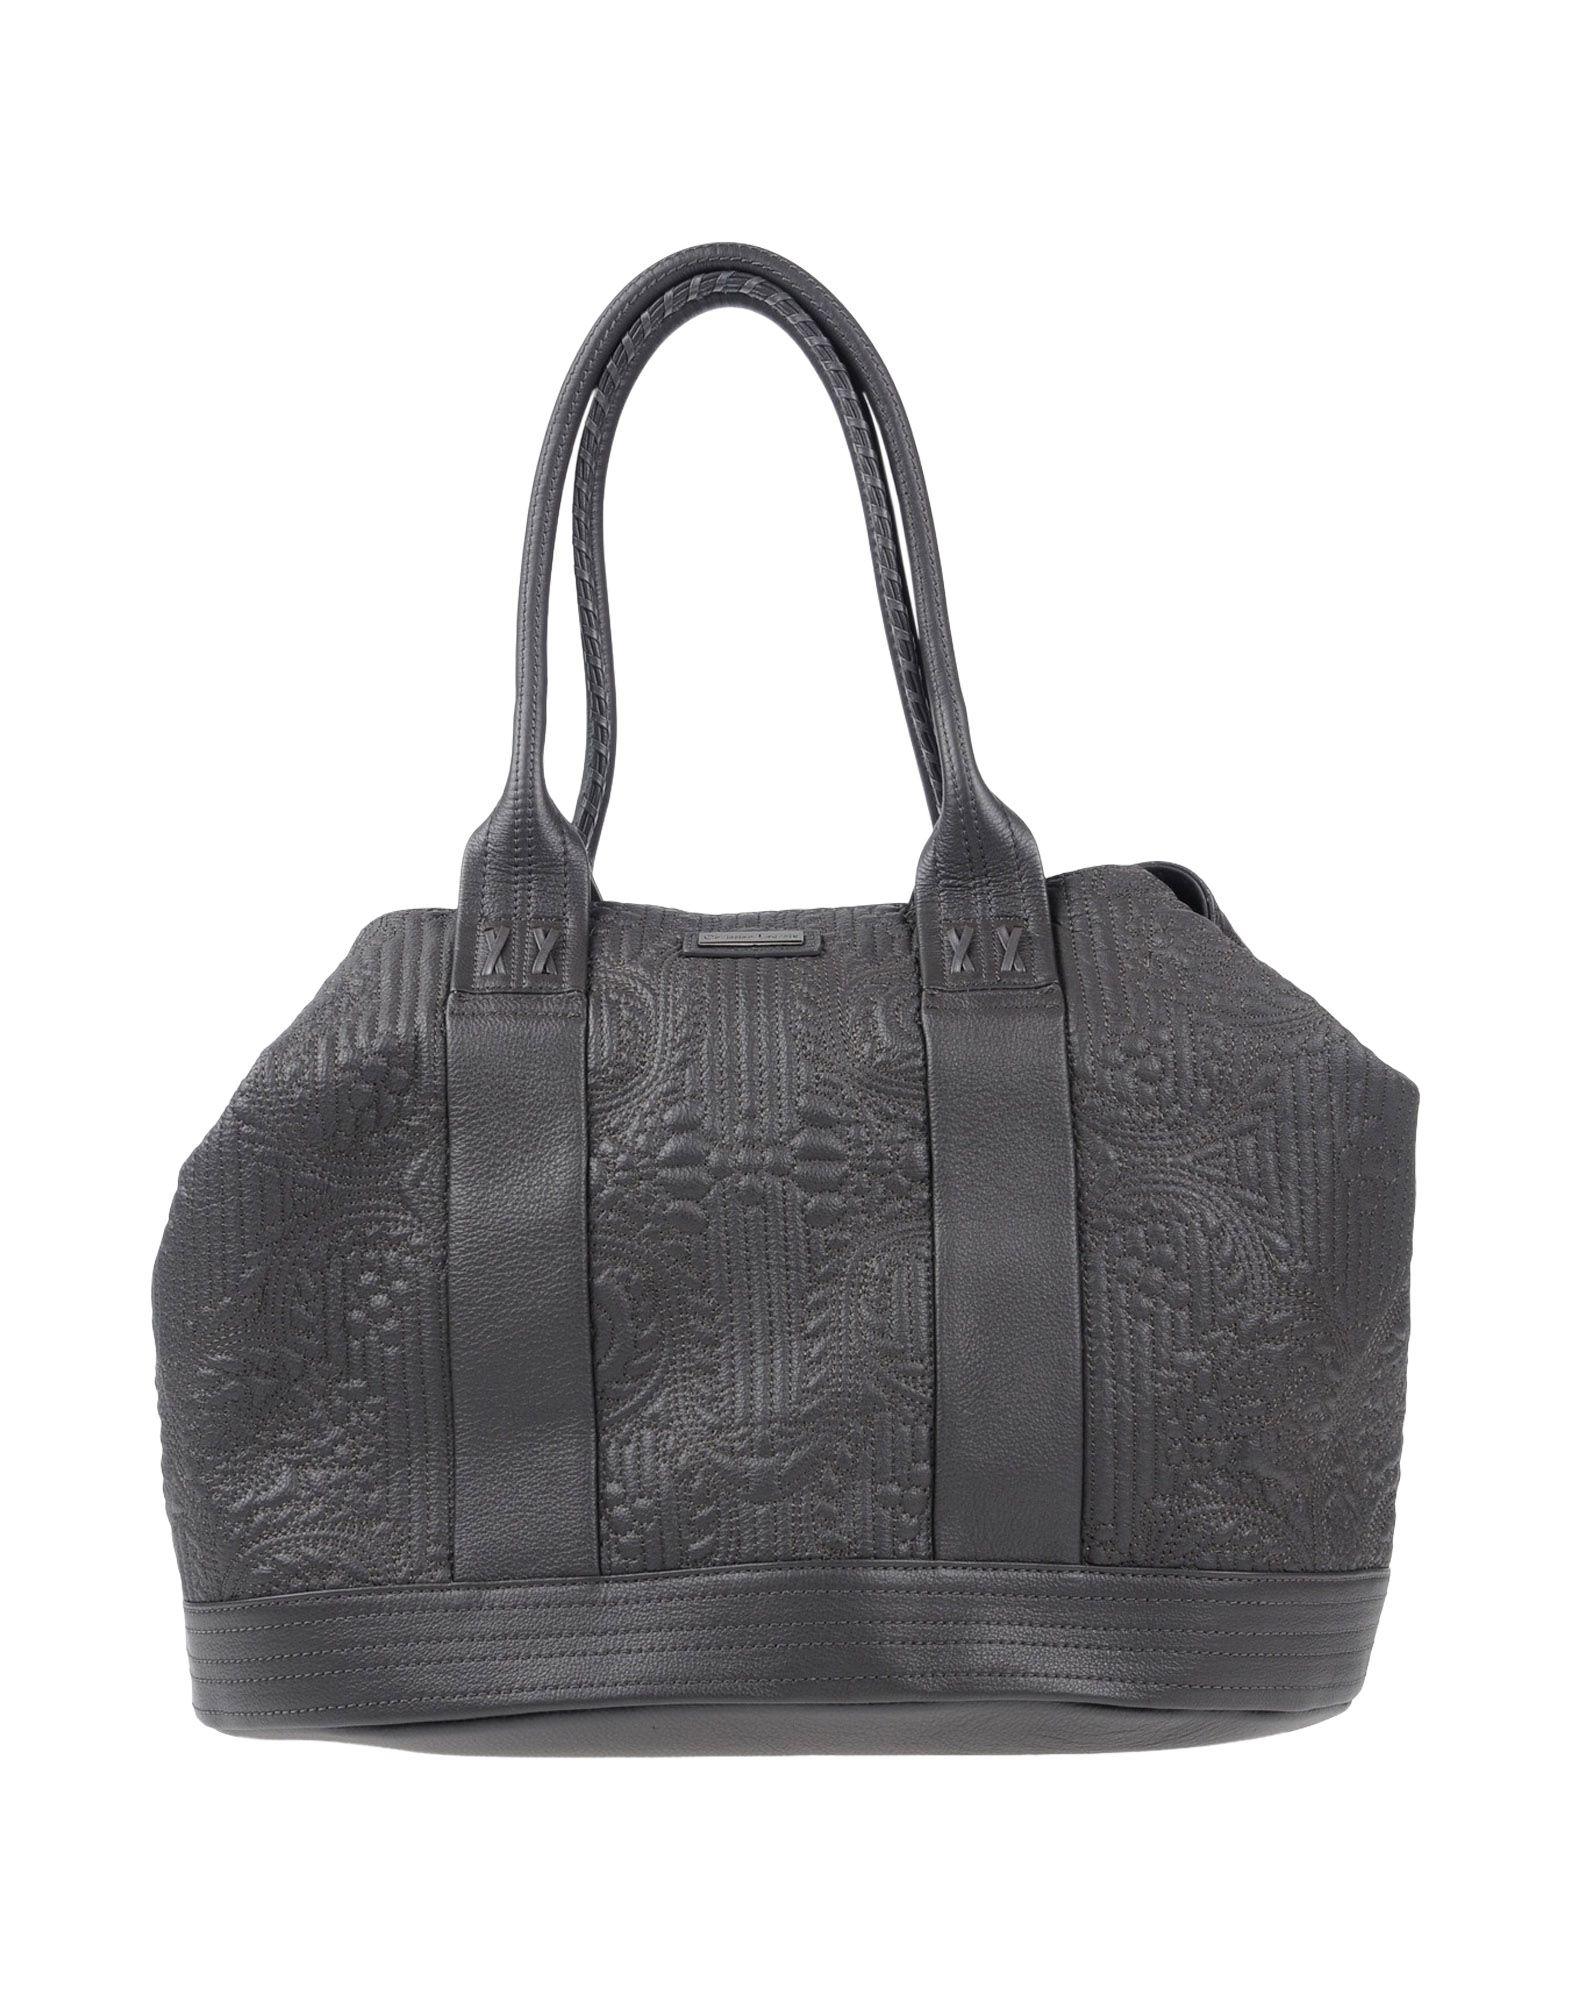 CHRISTIAN LACROIX Handbag in Grey